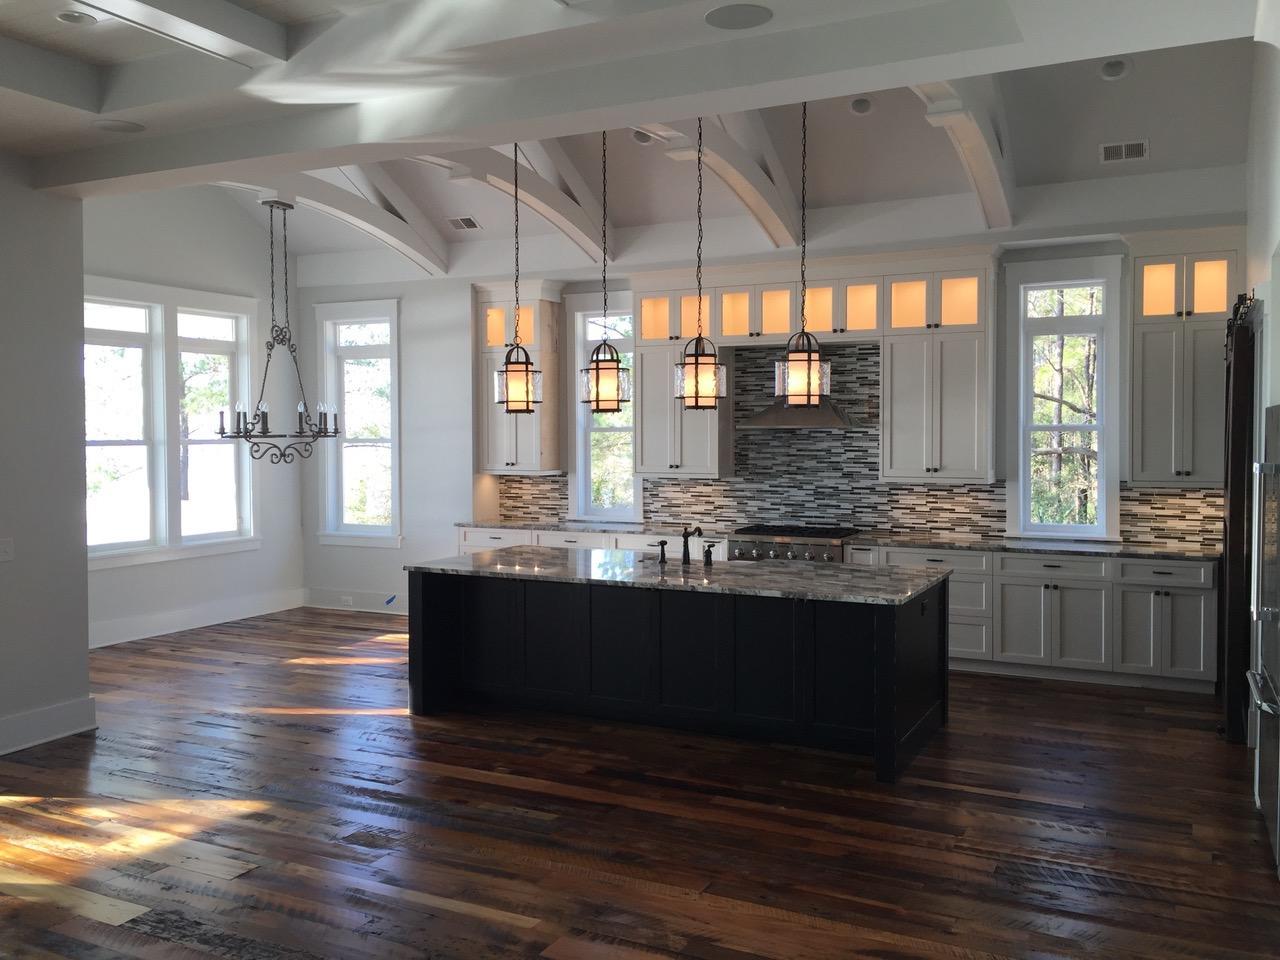 Kiawah River Estates Homes For Sale - 2918 Maritime Forest, Johns Island, SC - 18